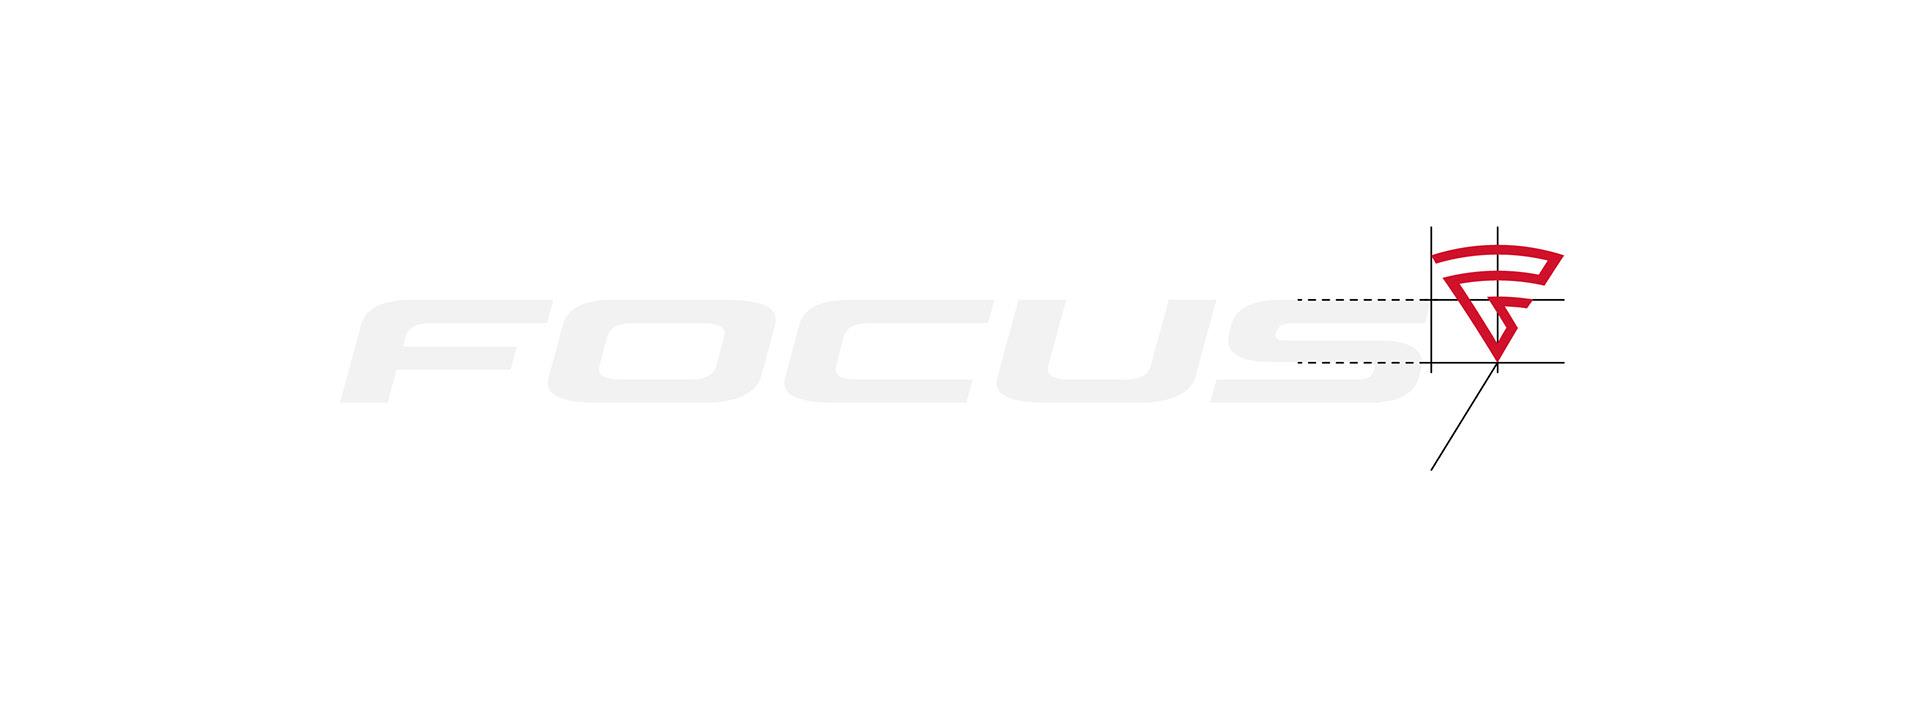 bergfest gesellschaft f r kommunikation mbh brand logo for focus bicycles. Black Bedroom Furniture Sets. Home Design Ideas